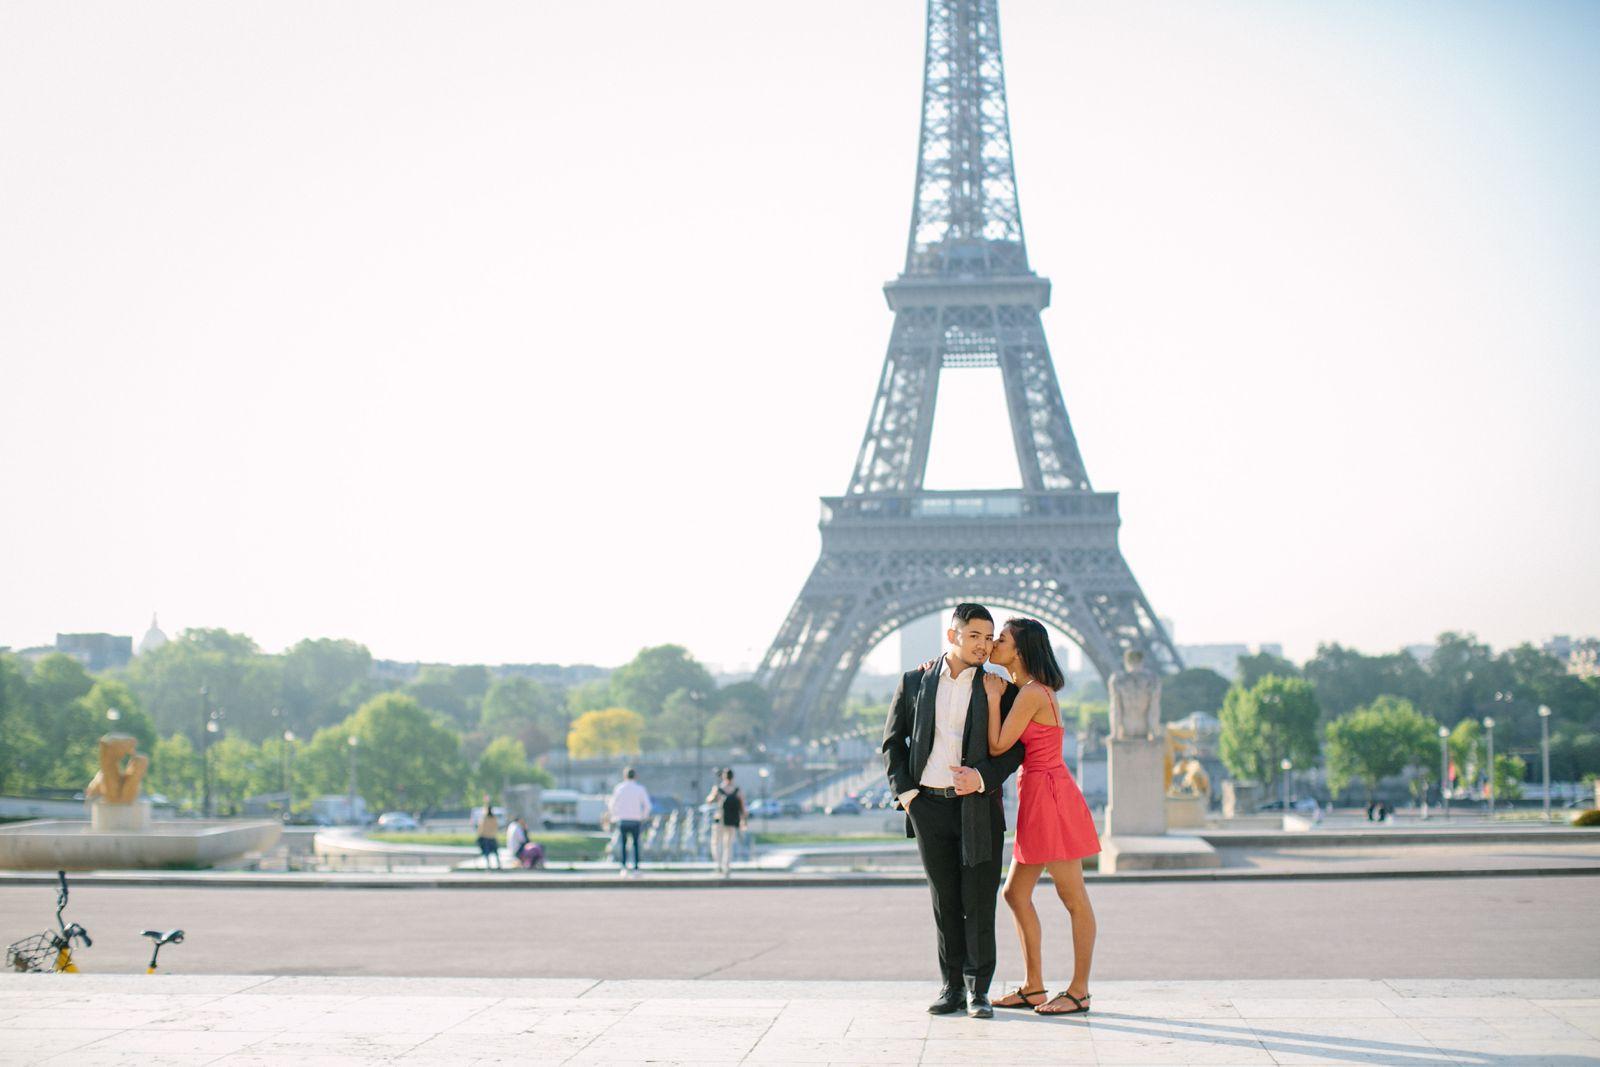 EngagementShoot-Eiffel-Tower_1283.jpg